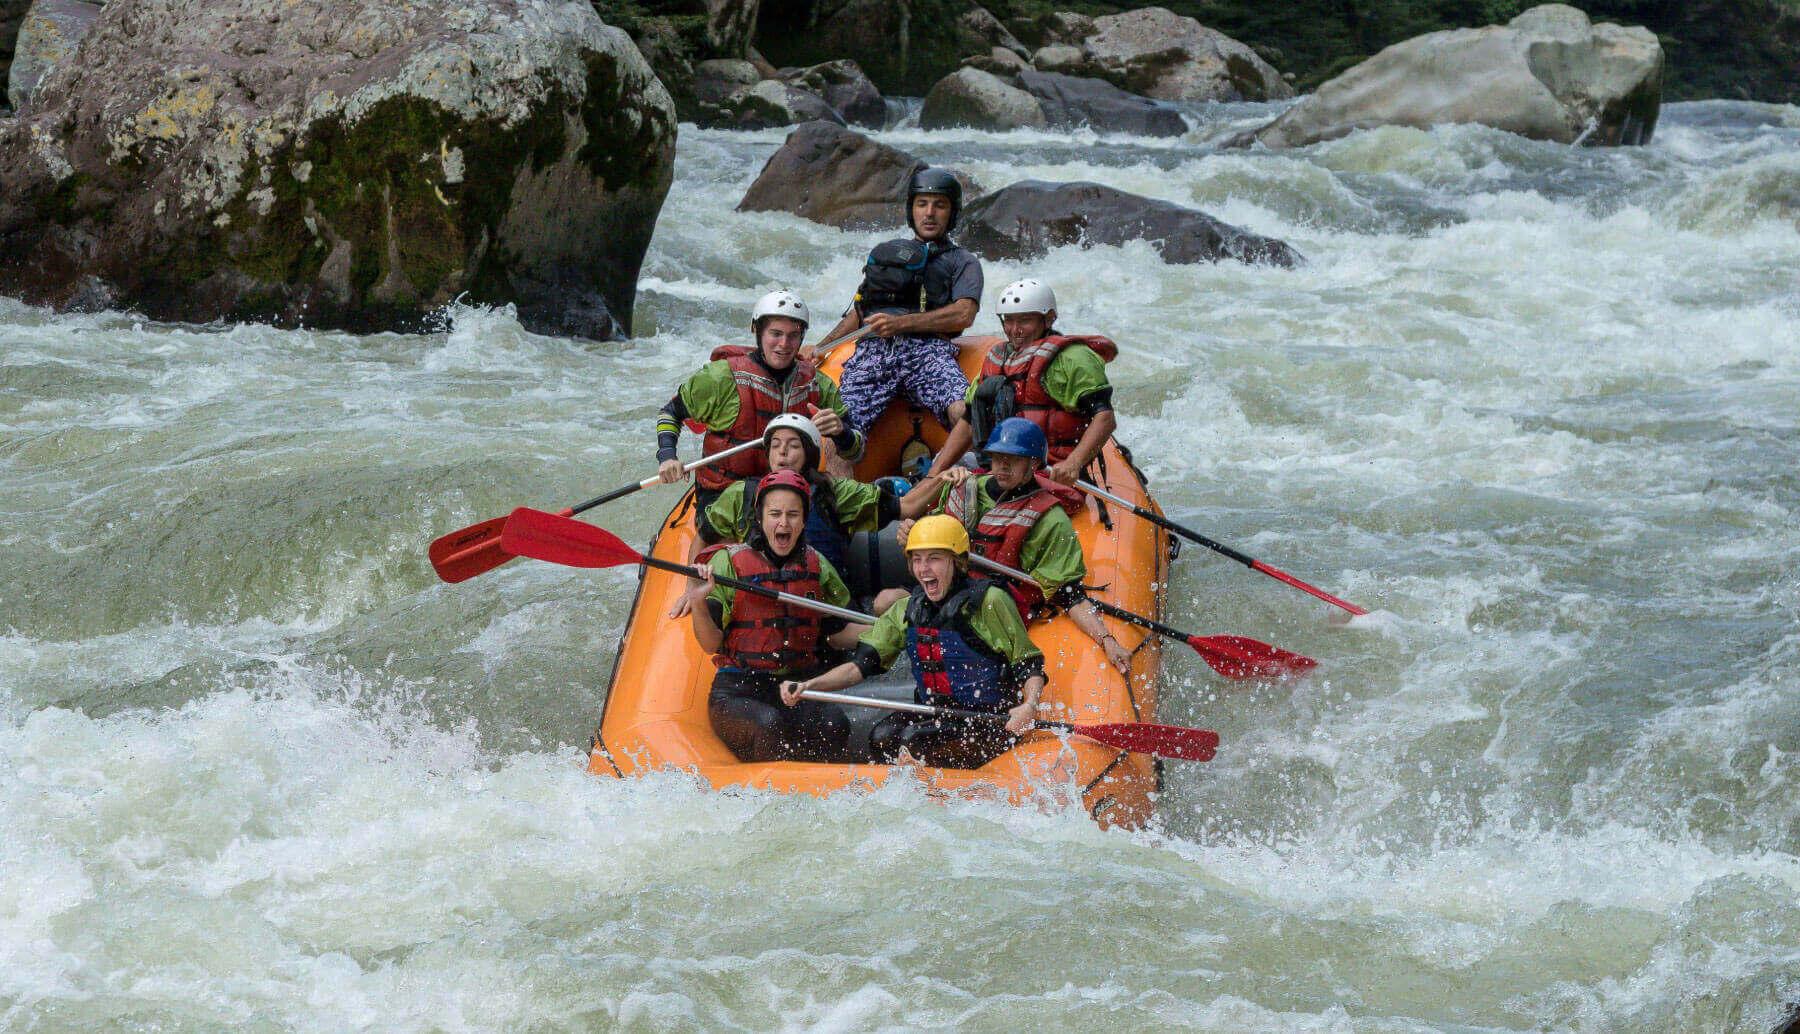 Rafting class IV in the Jondachi river